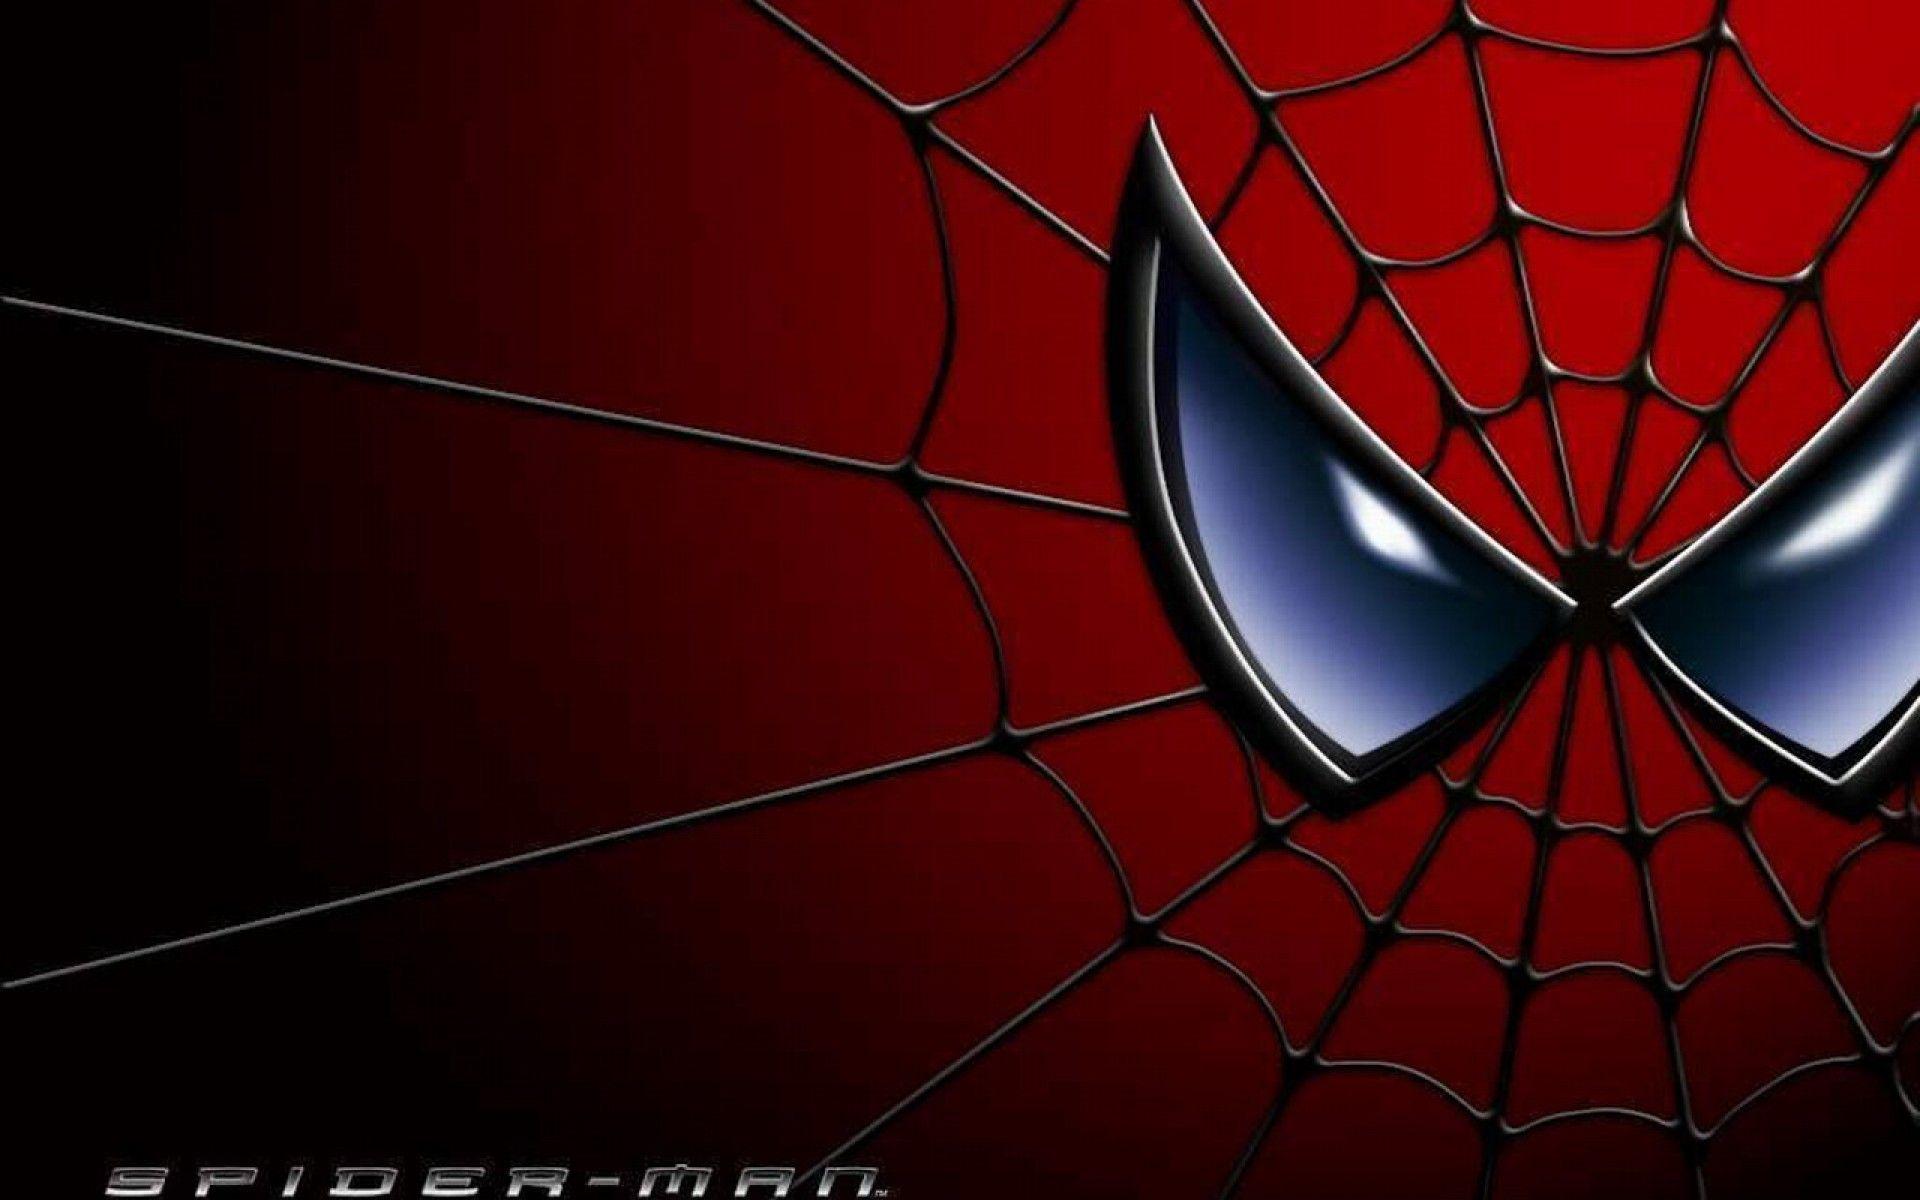 Spiderman Wallpapers Full Hd Wallpaper Search Logo